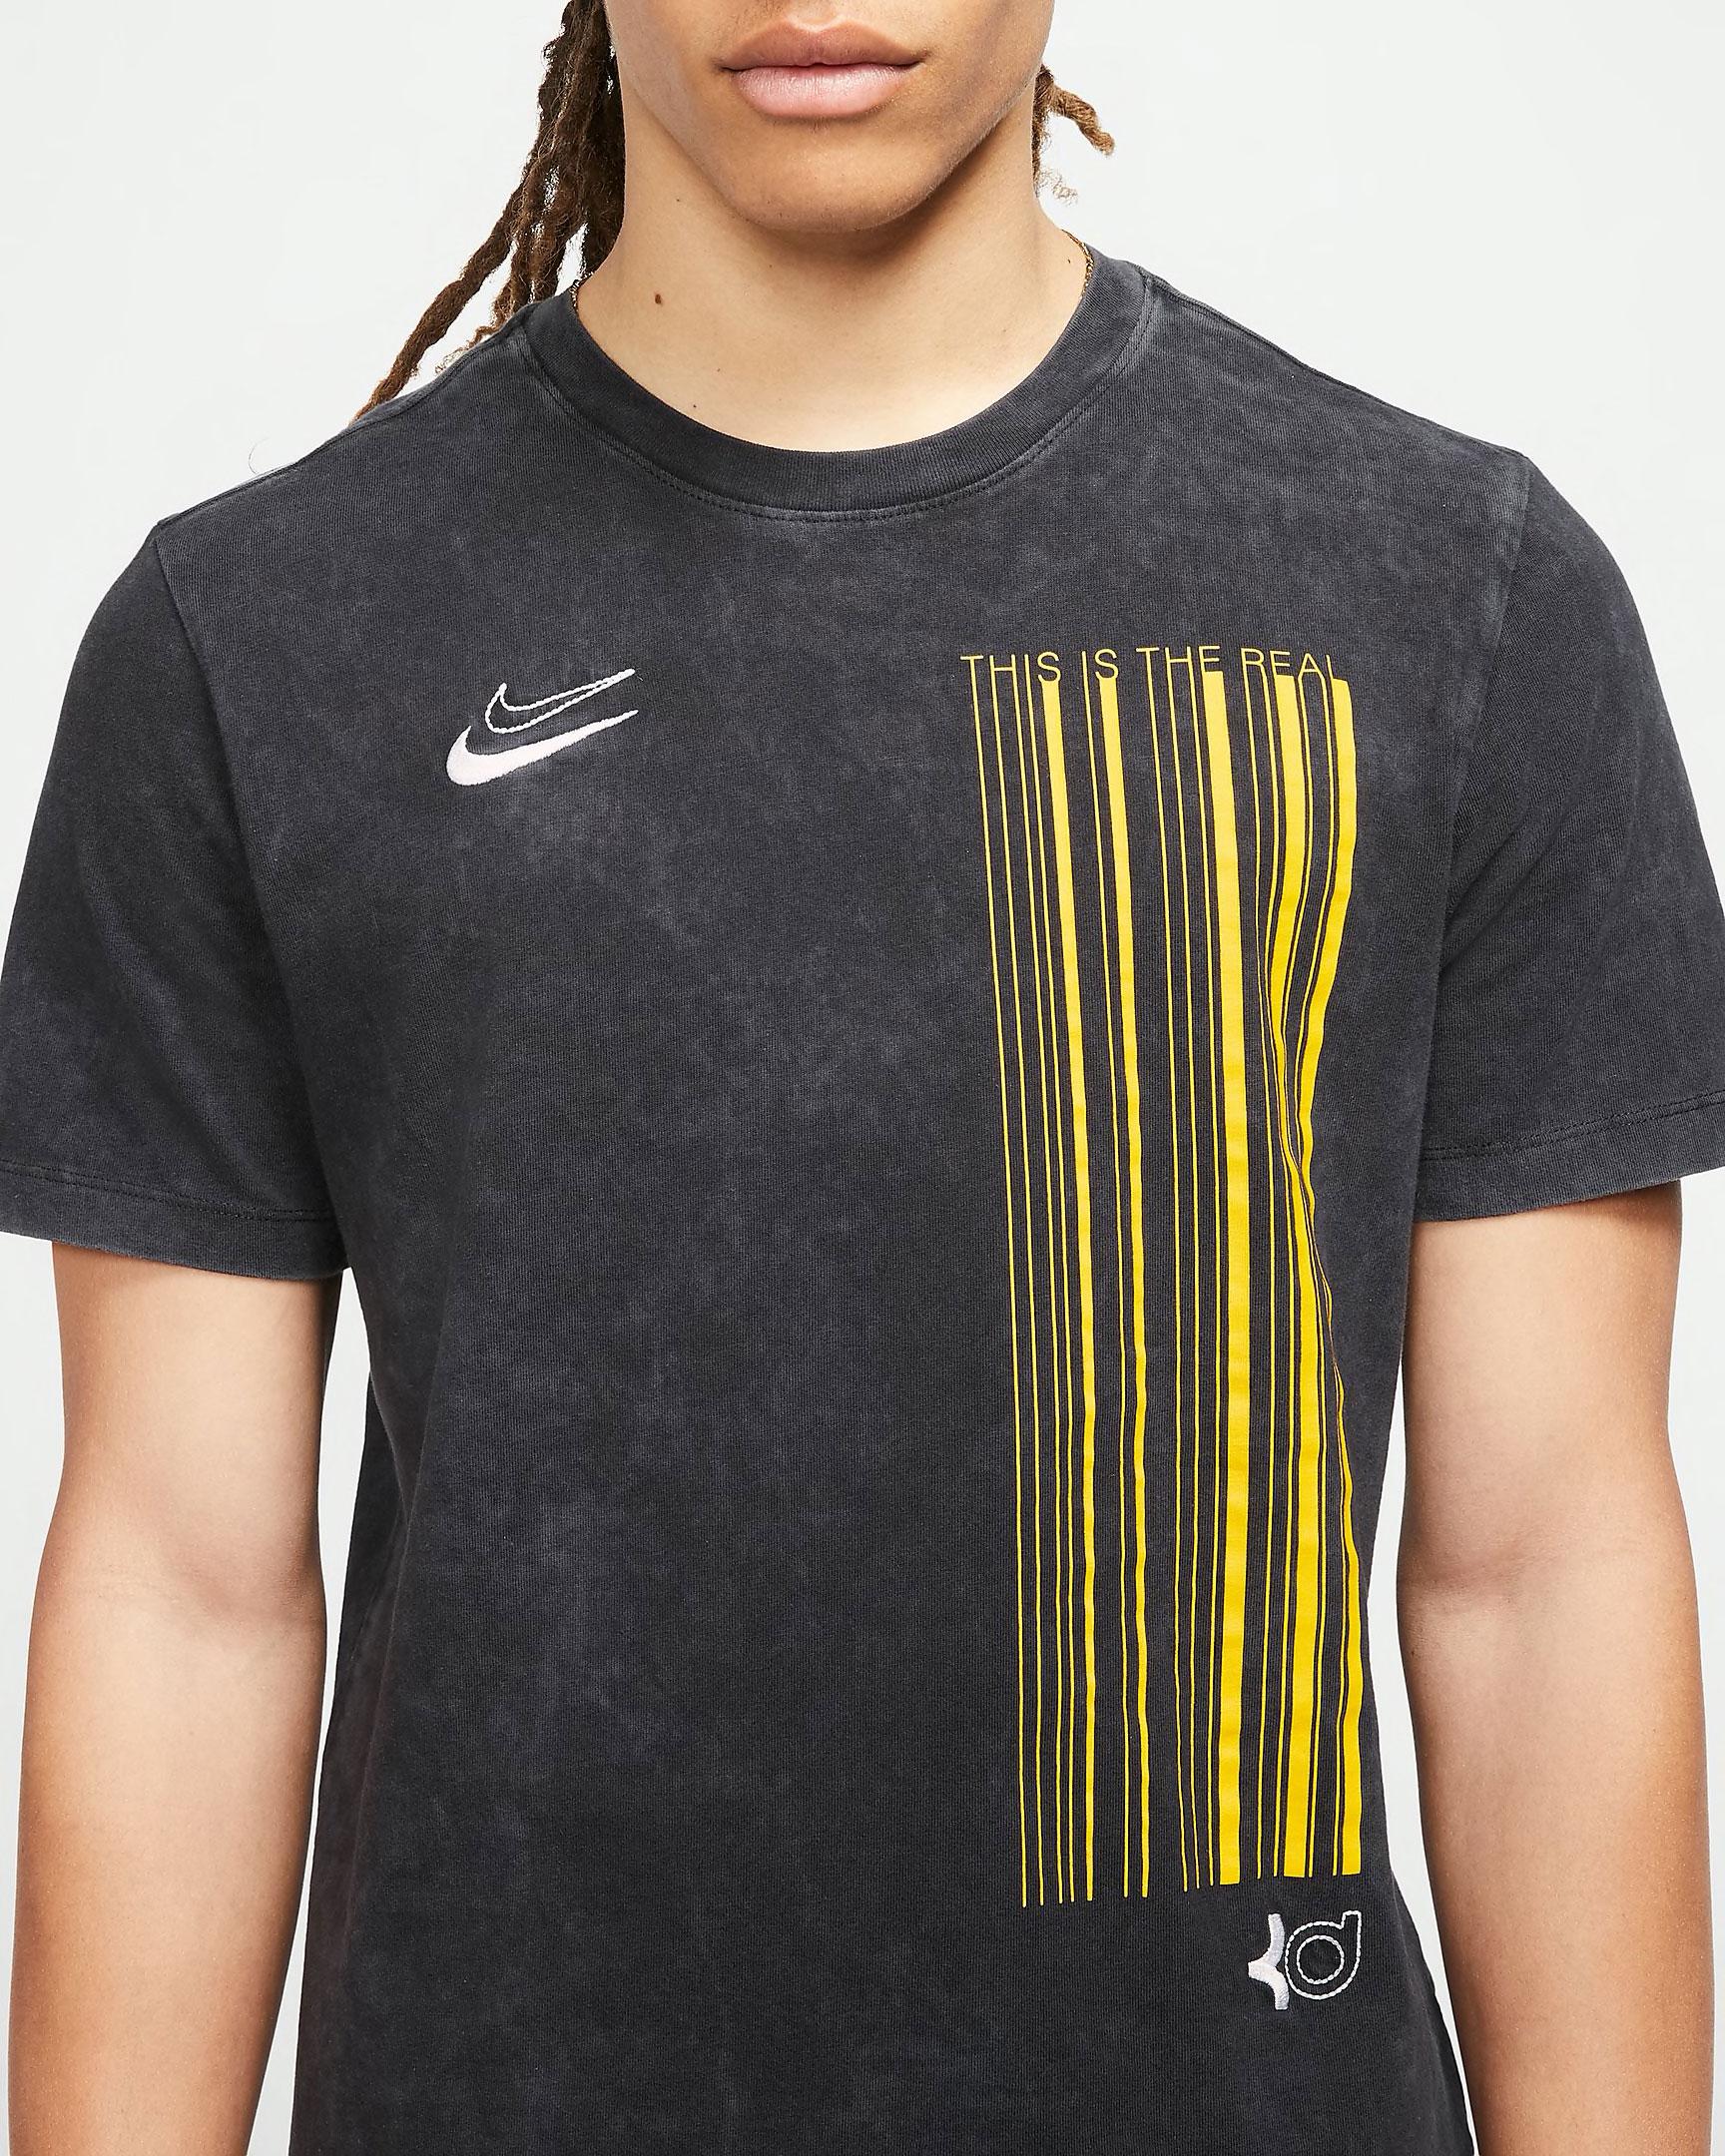 nike-kd-13-hype-shirt-3